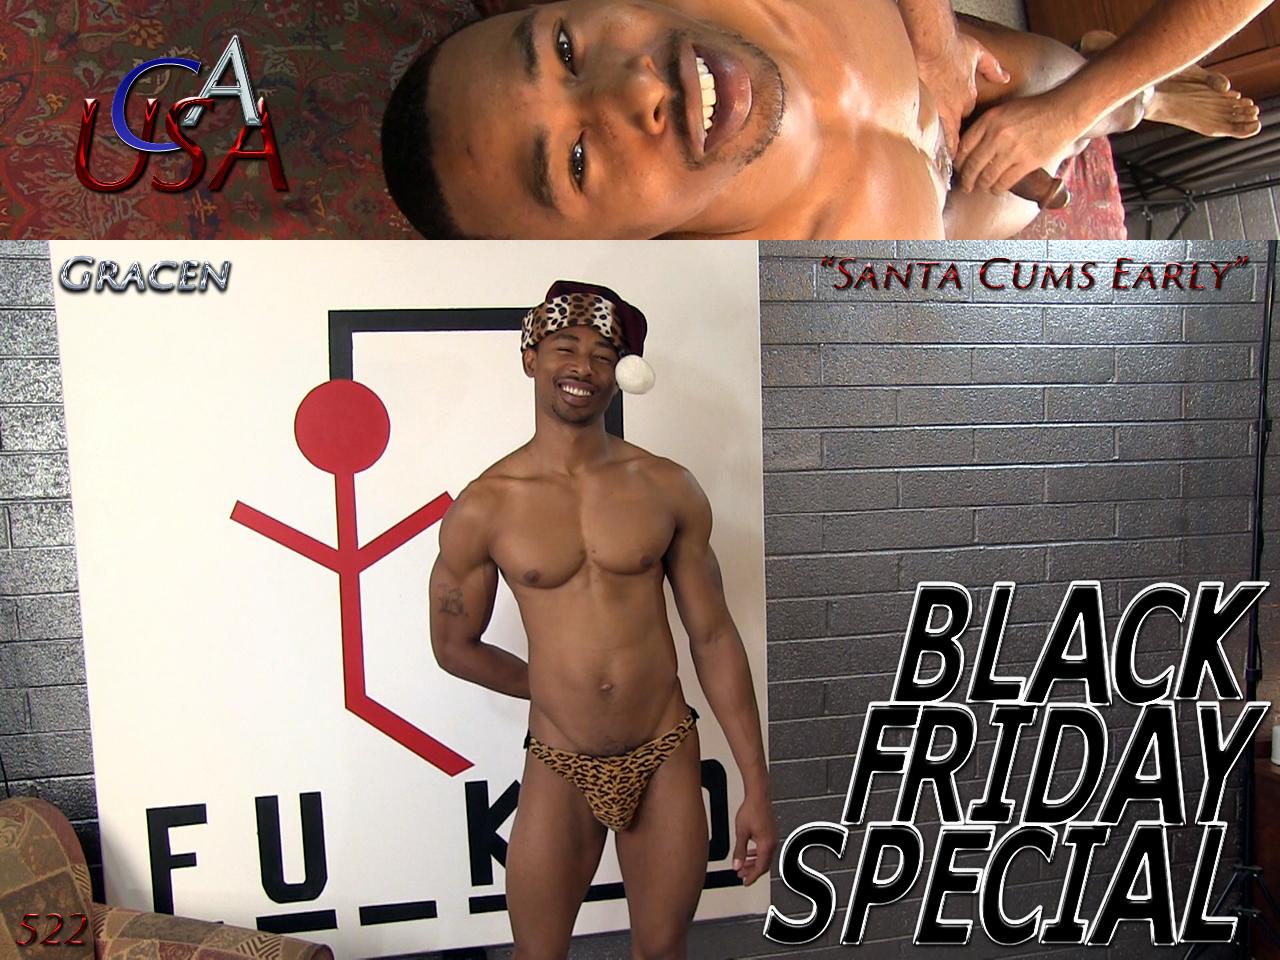 Gay Black Santa 100